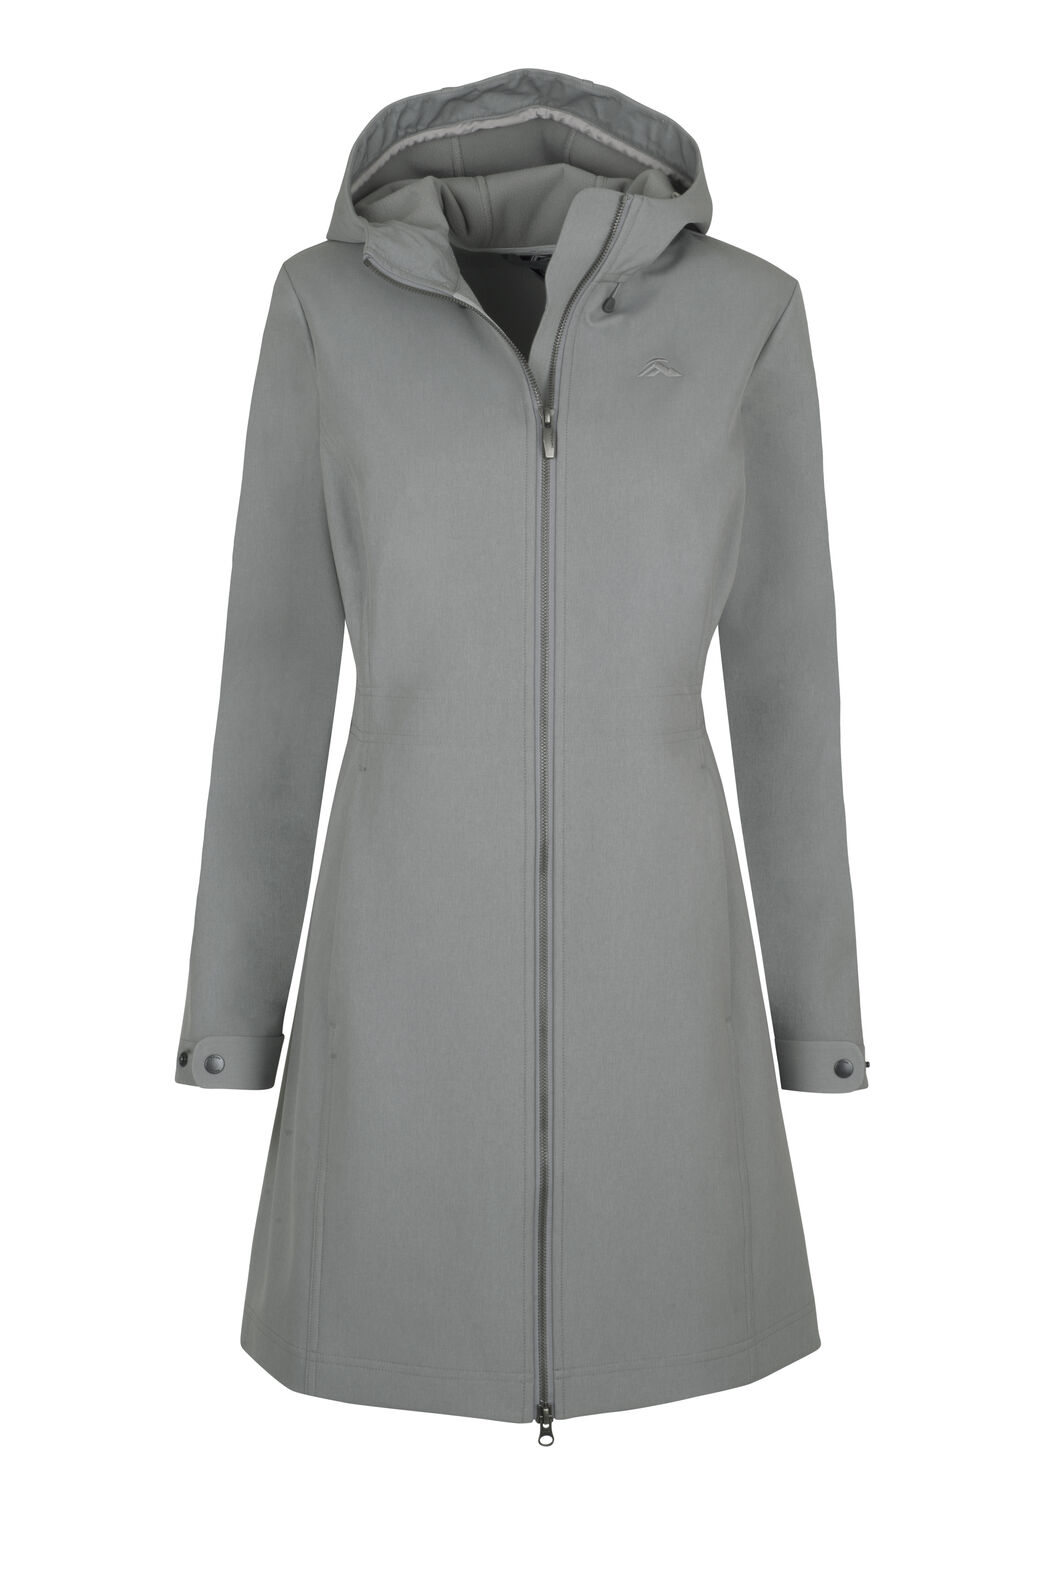 Chord Softshell Coat - Women's, Monument, hi-res